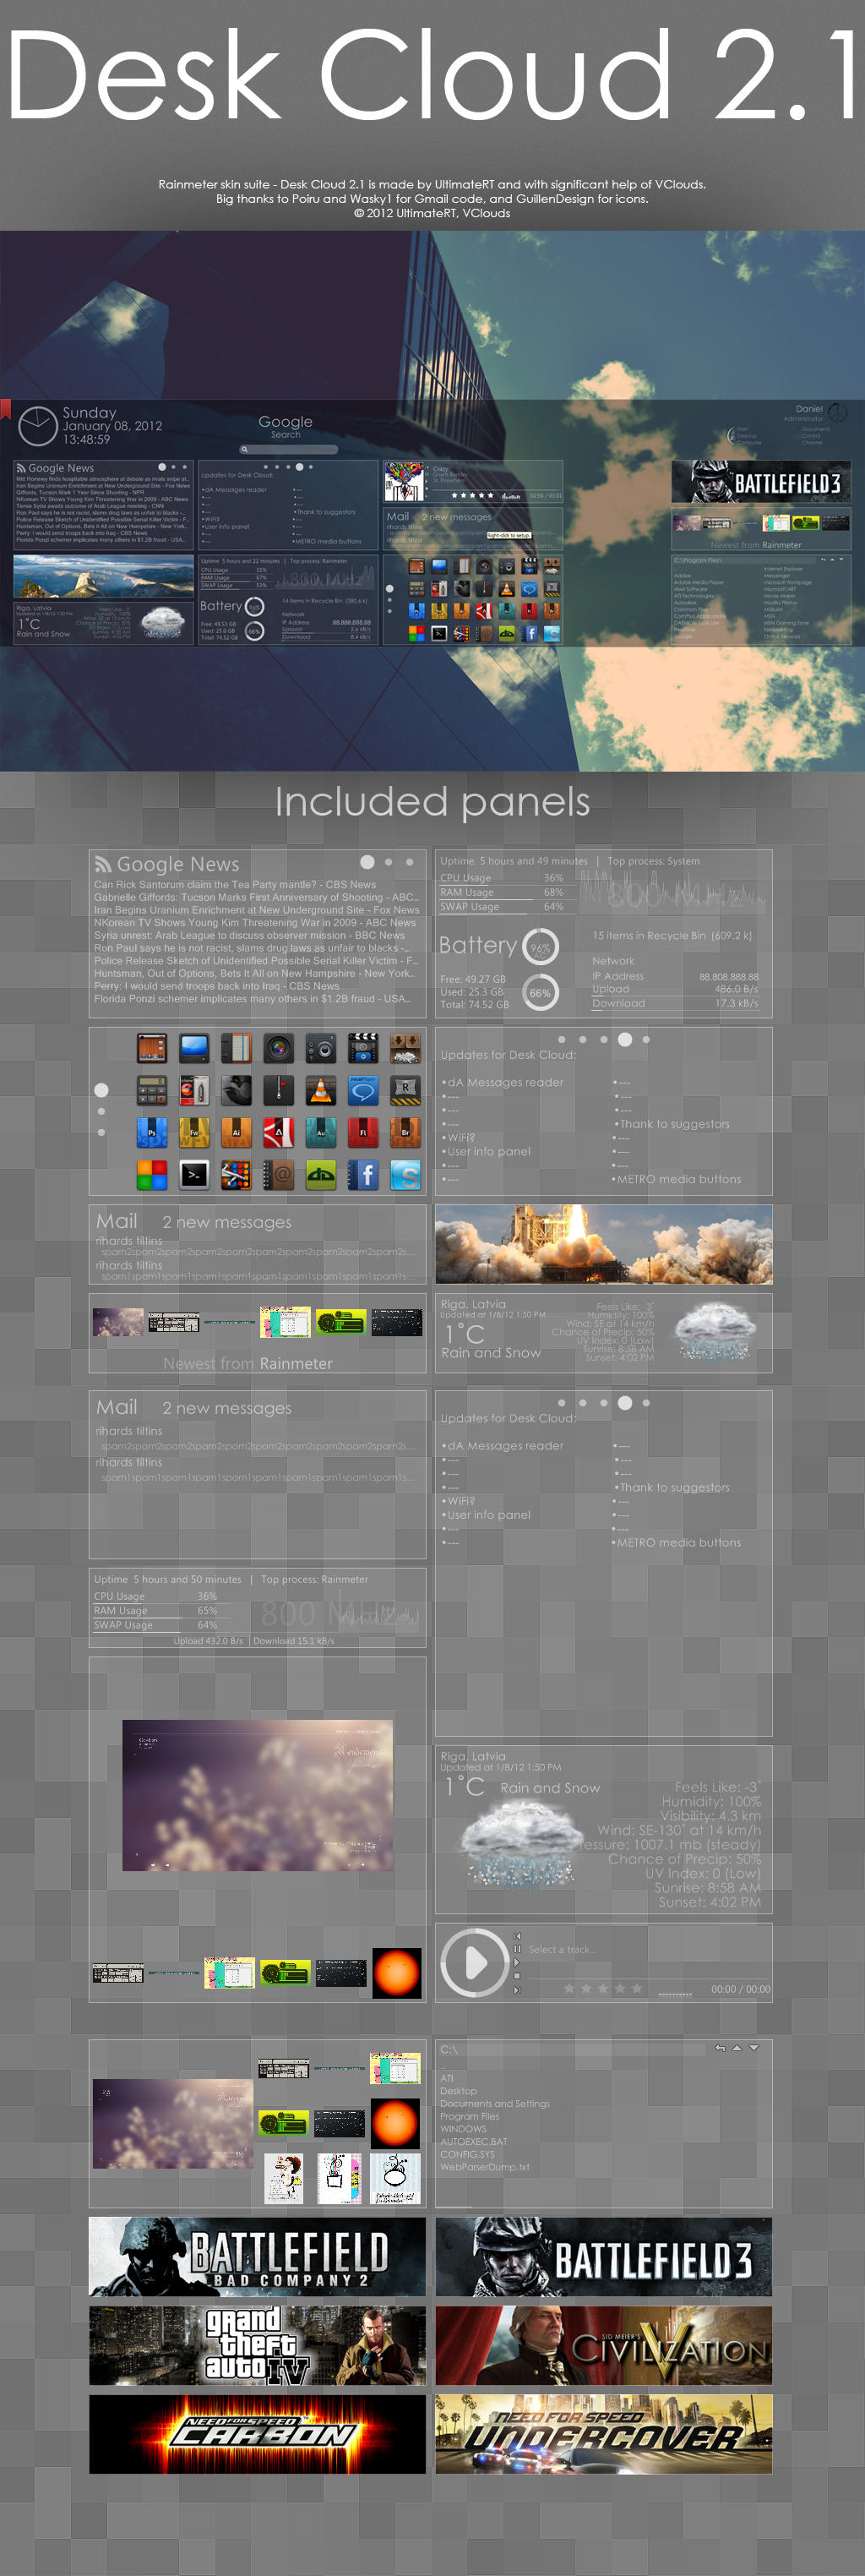 Desk Cloud 2.1 by UltimateRT